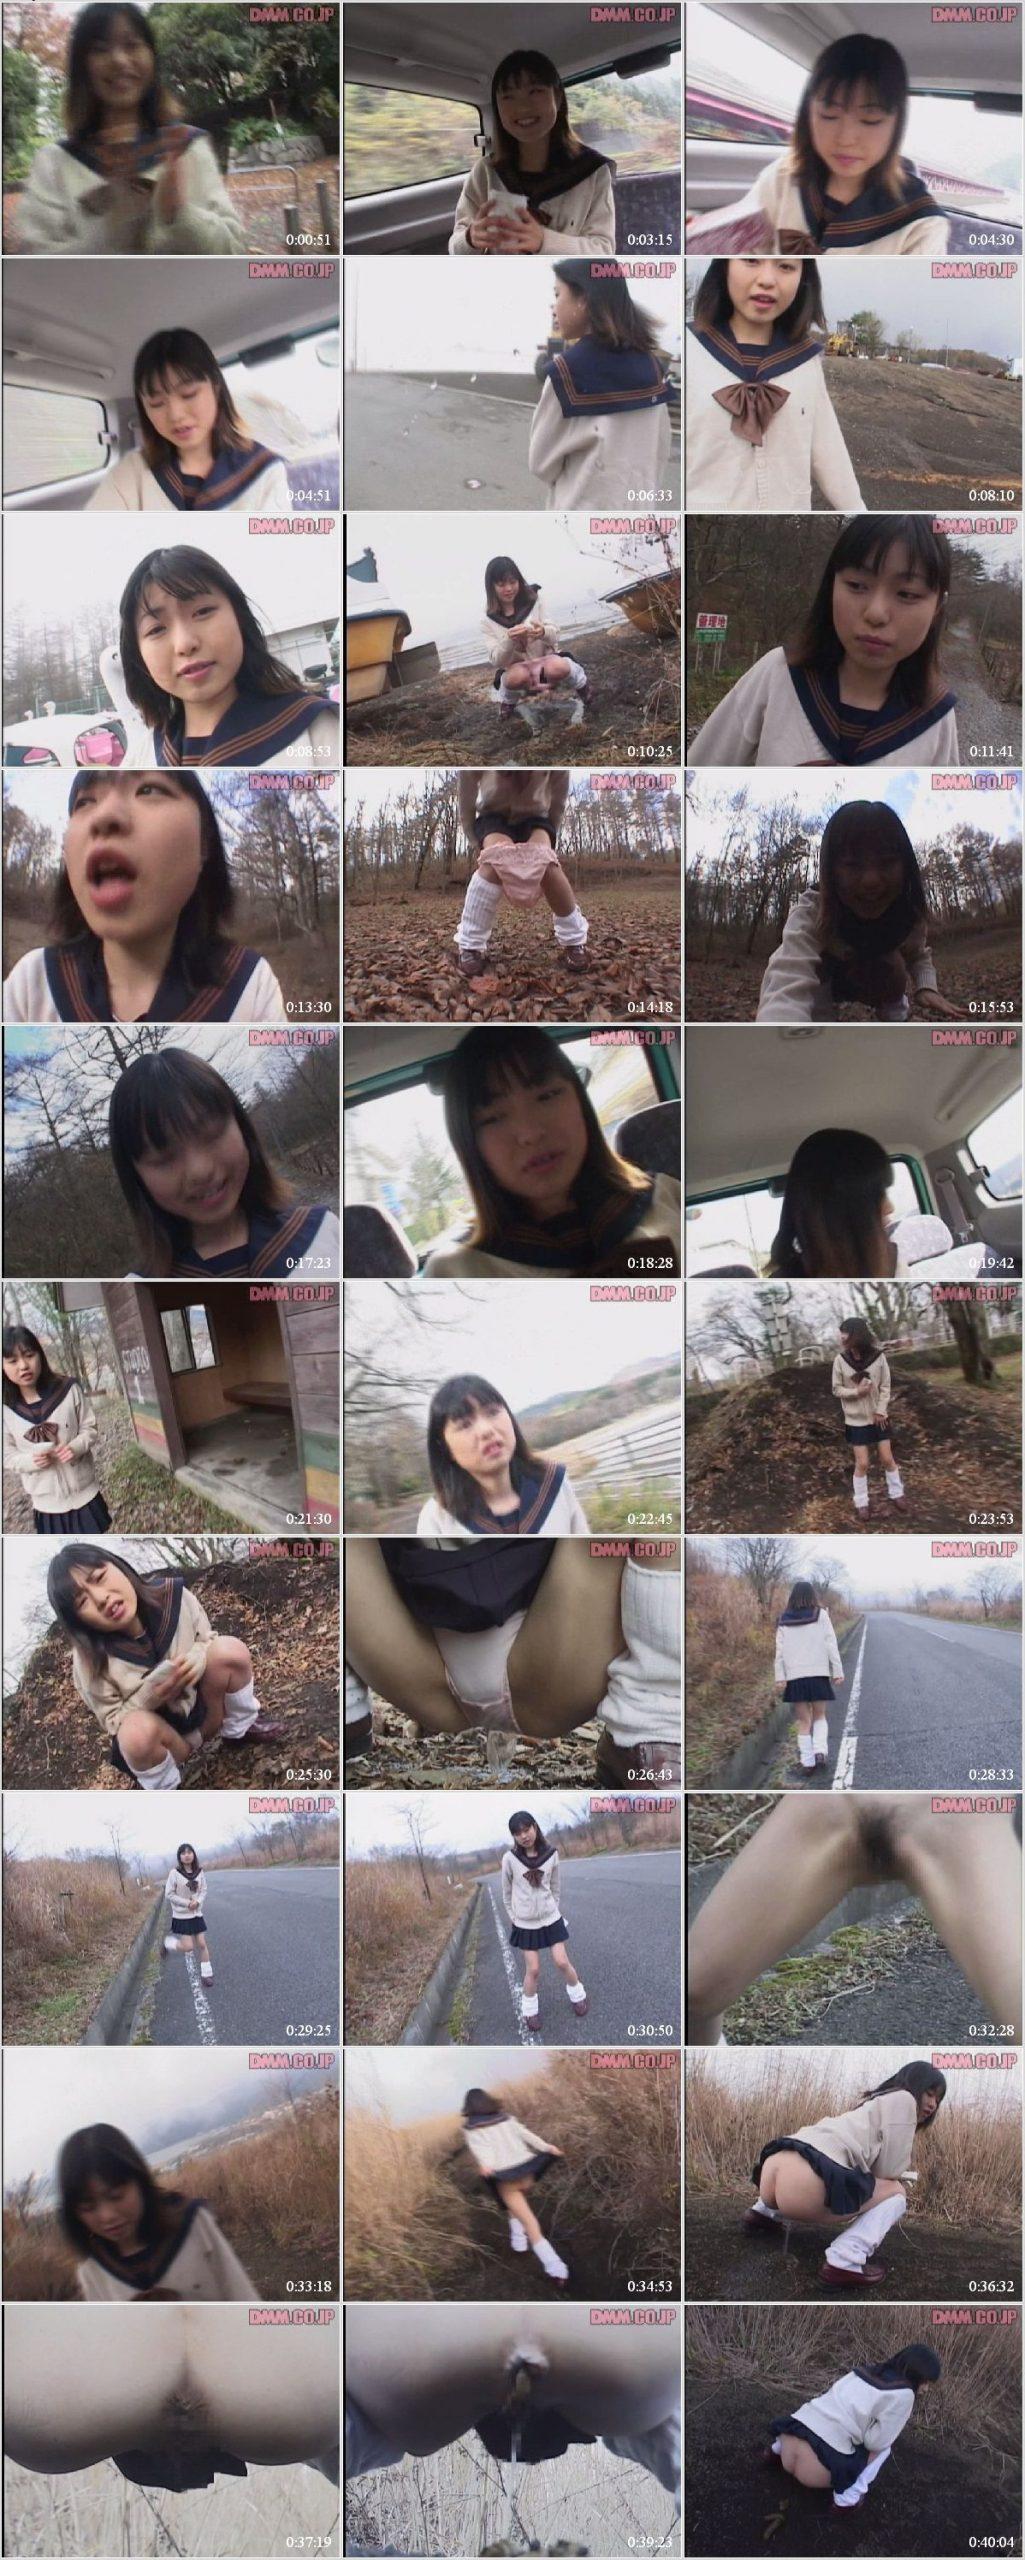 YZE 07 t scaled - [YZE-07] 屋外で女子高生アンナ倉本排泄 Scat.